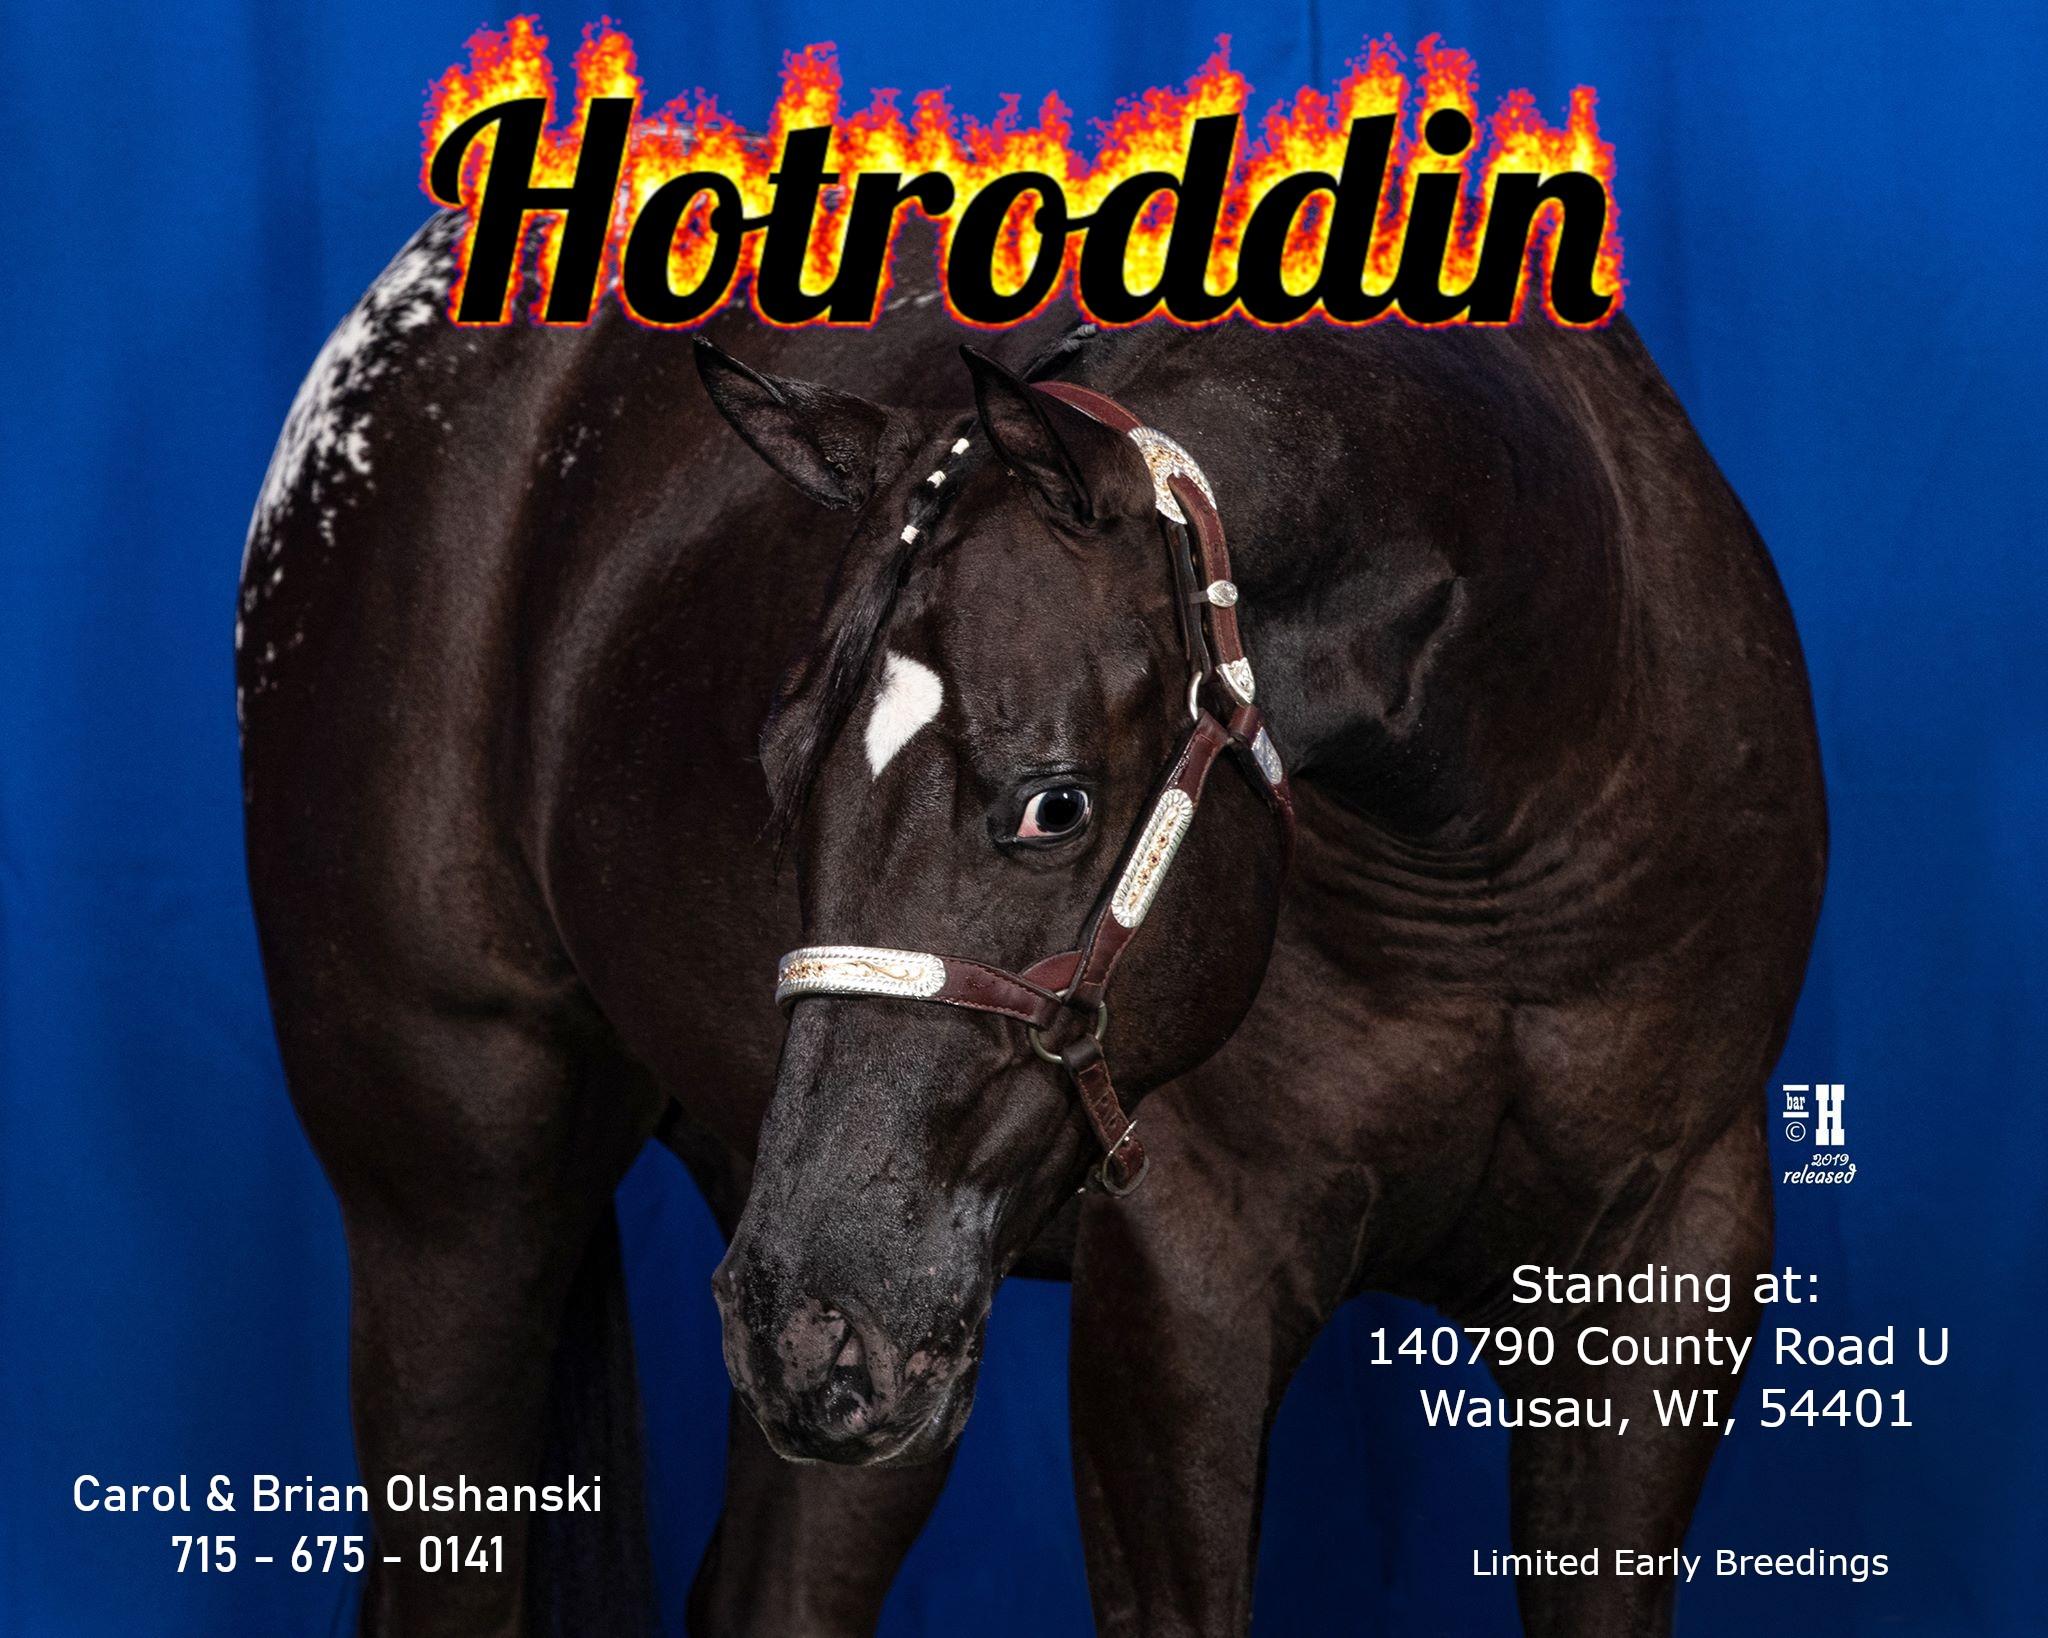 Hotroddin - Purchased